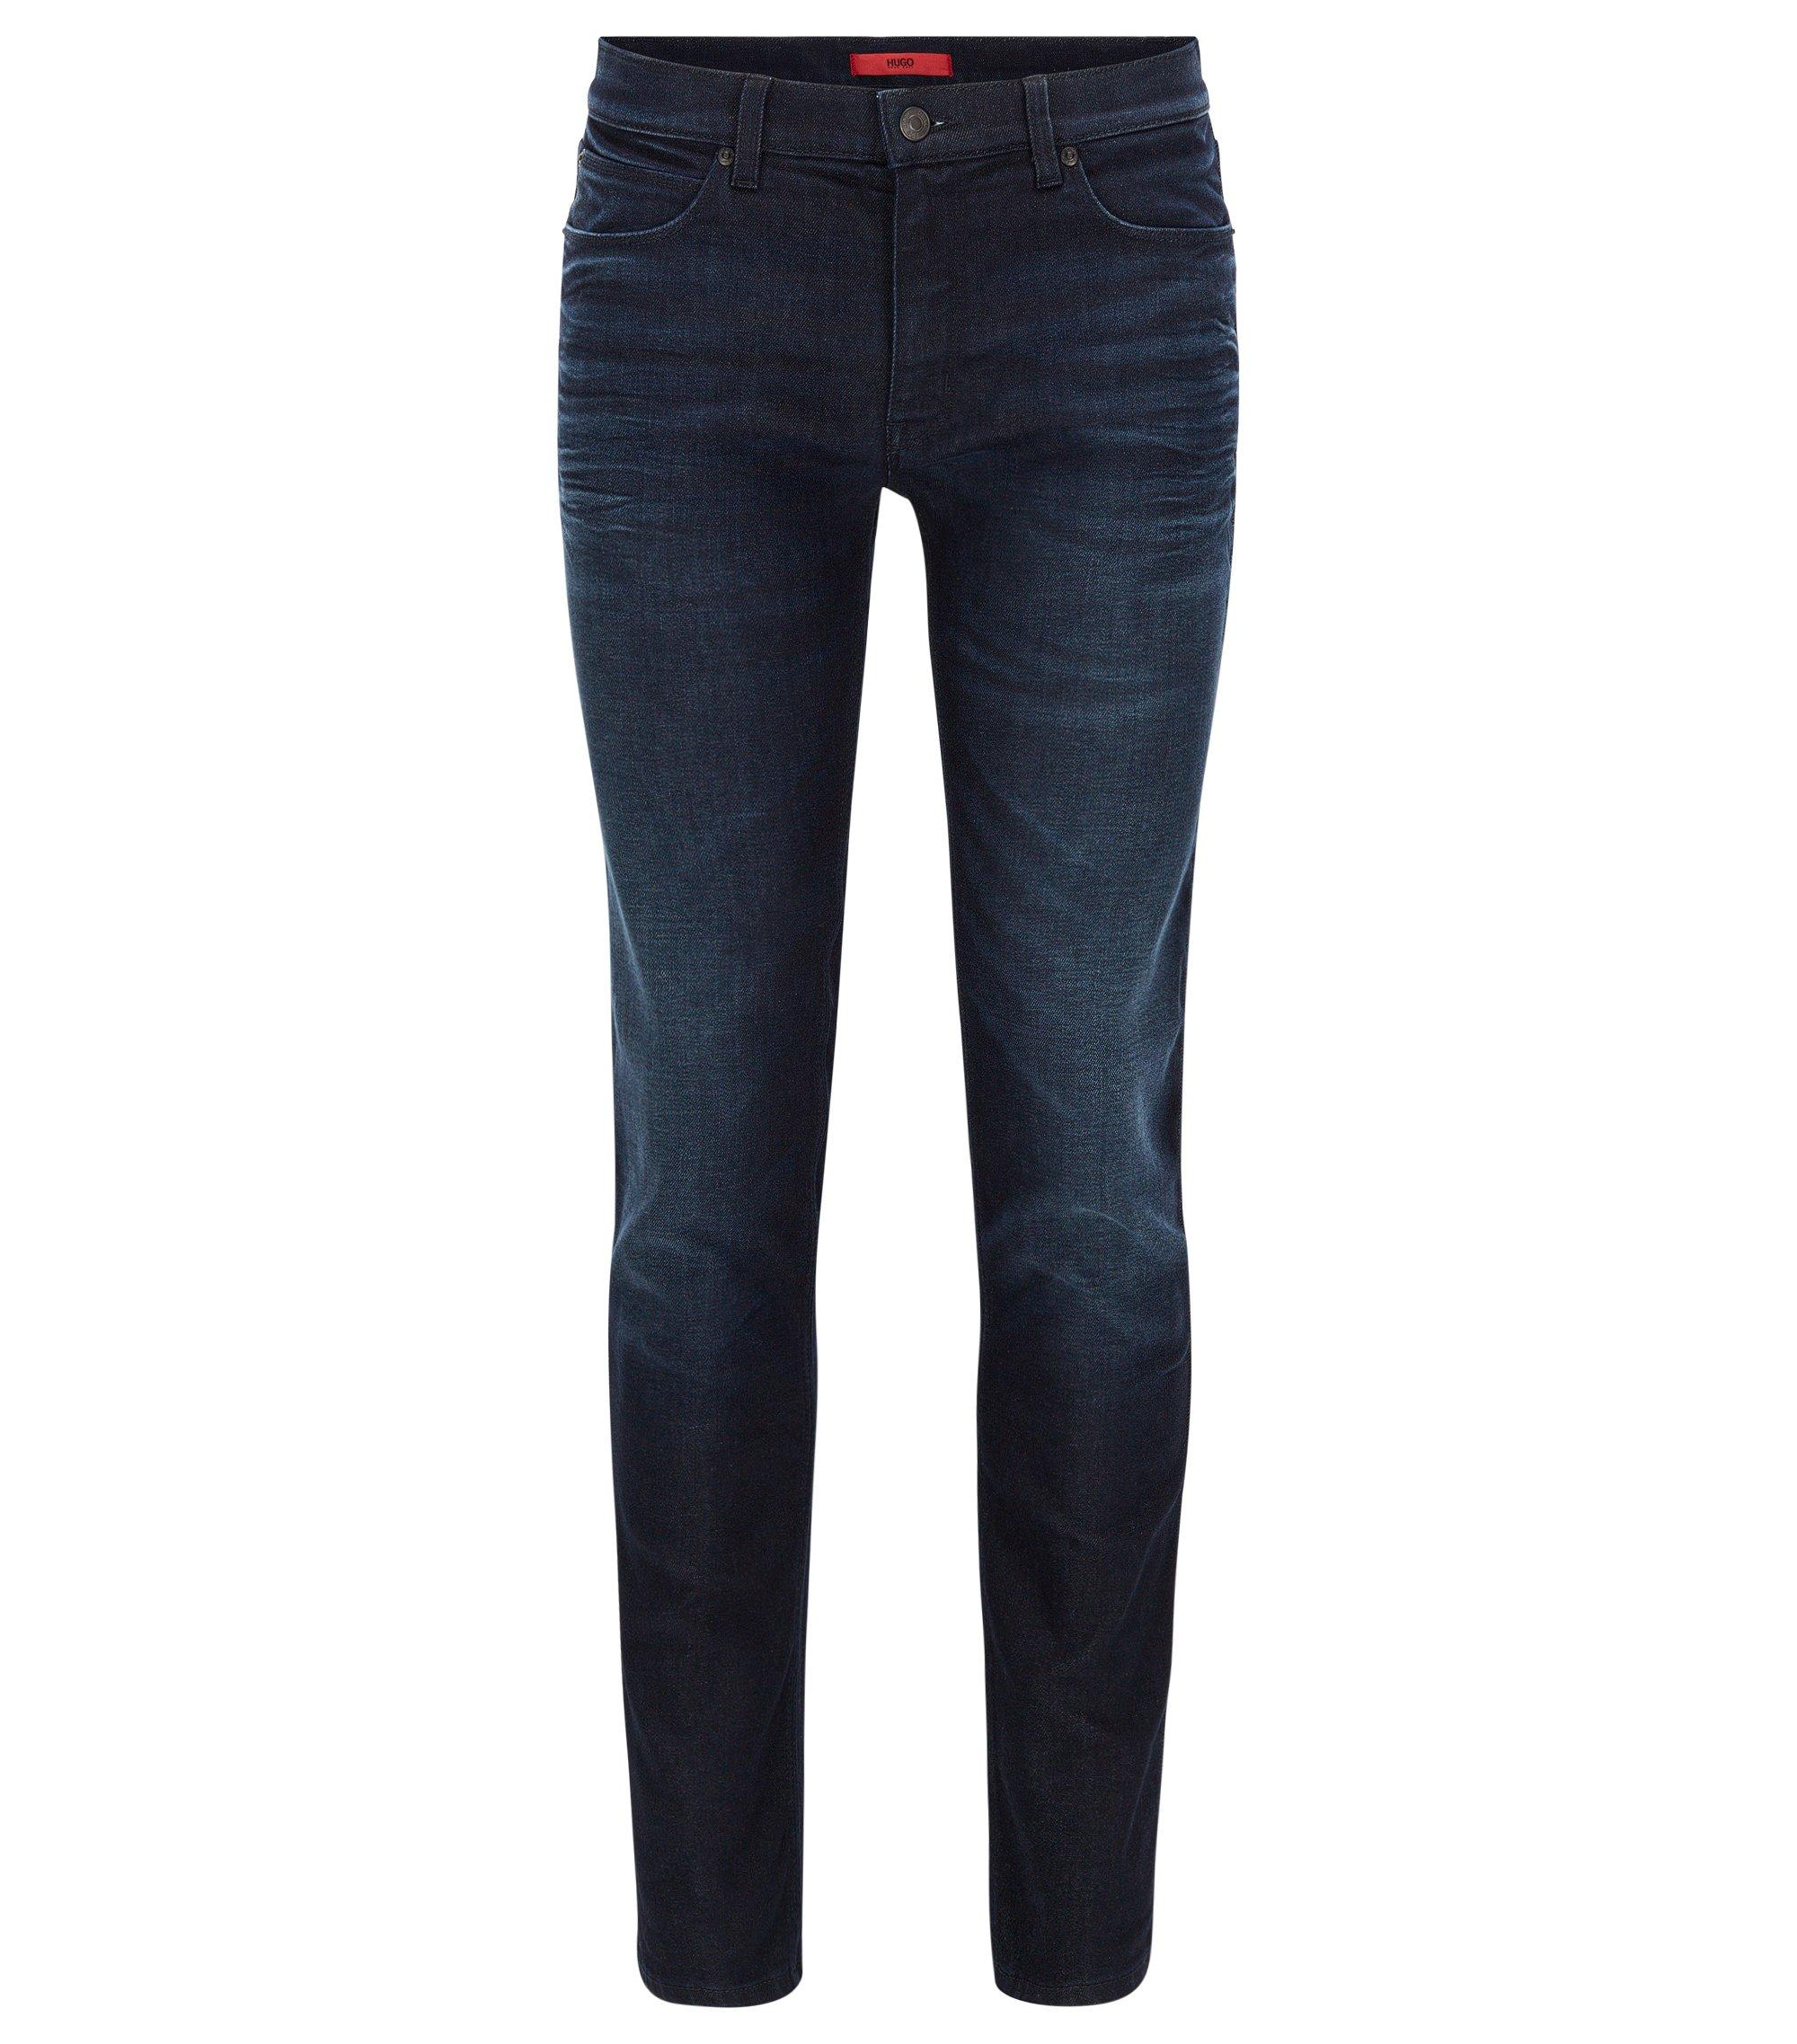 Stretch Cotton Jeans, Slim Fit | HUGO 708, Dark Blue